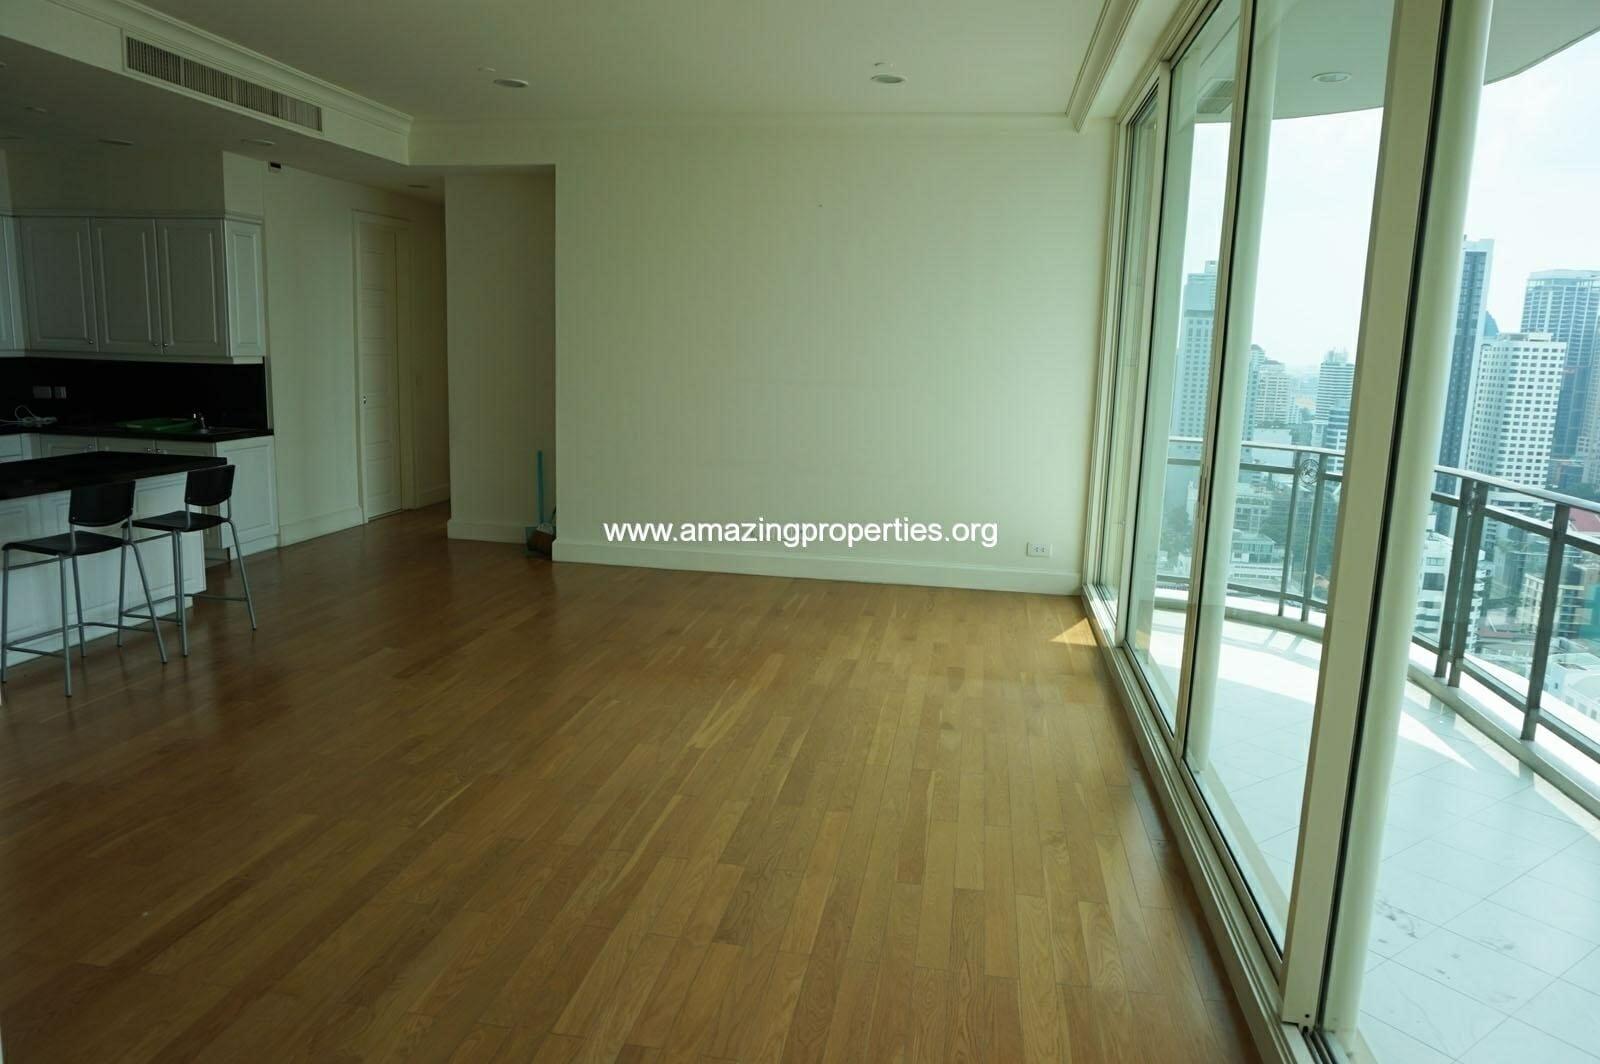 3 Bedroom Royce Private Residence